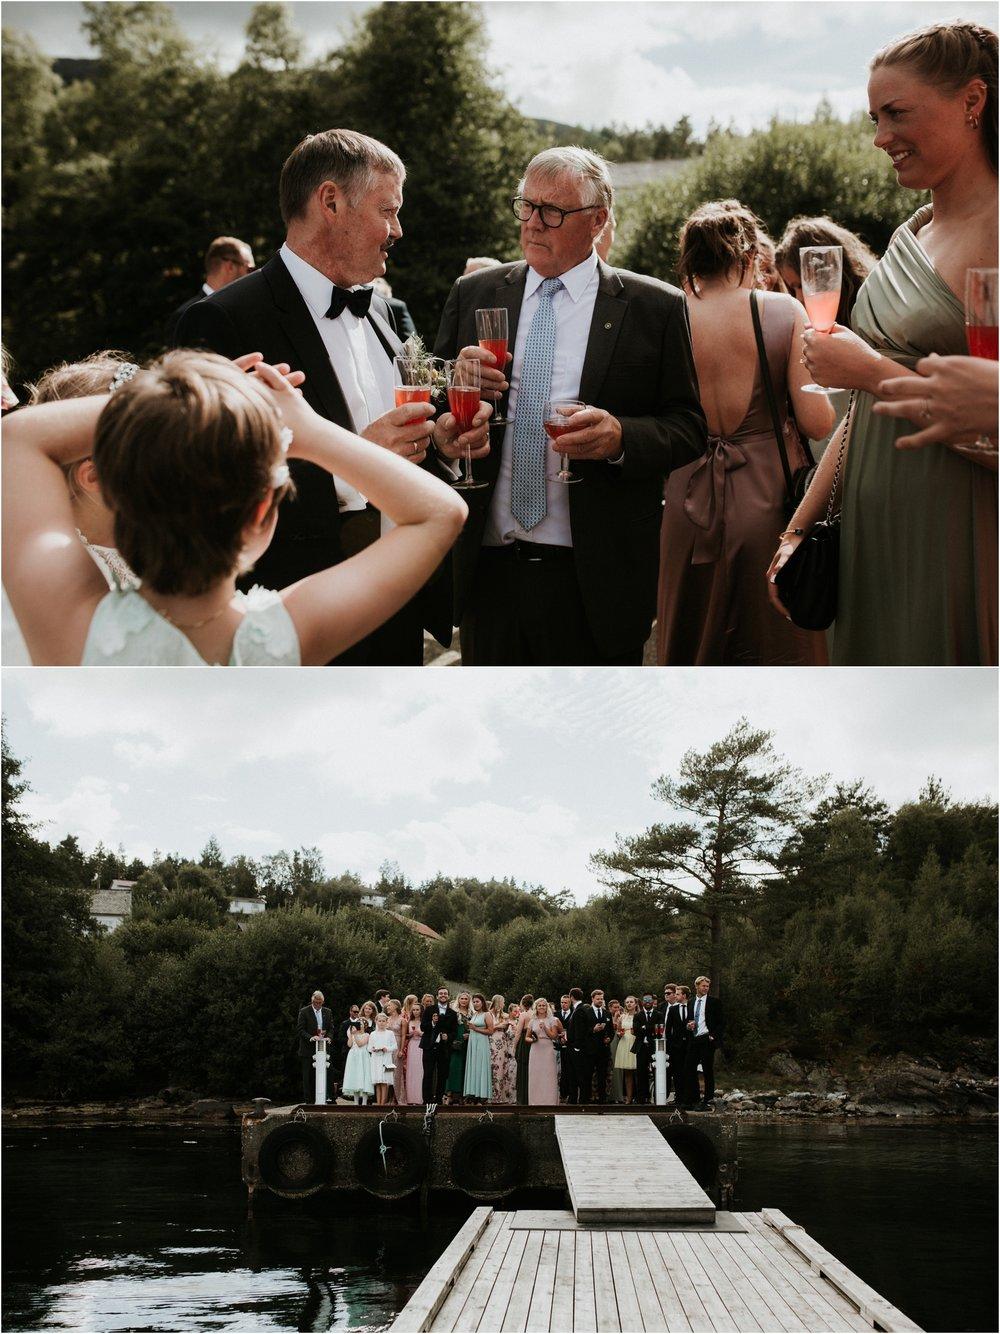 Norway-wedding-photographer-171.jpg